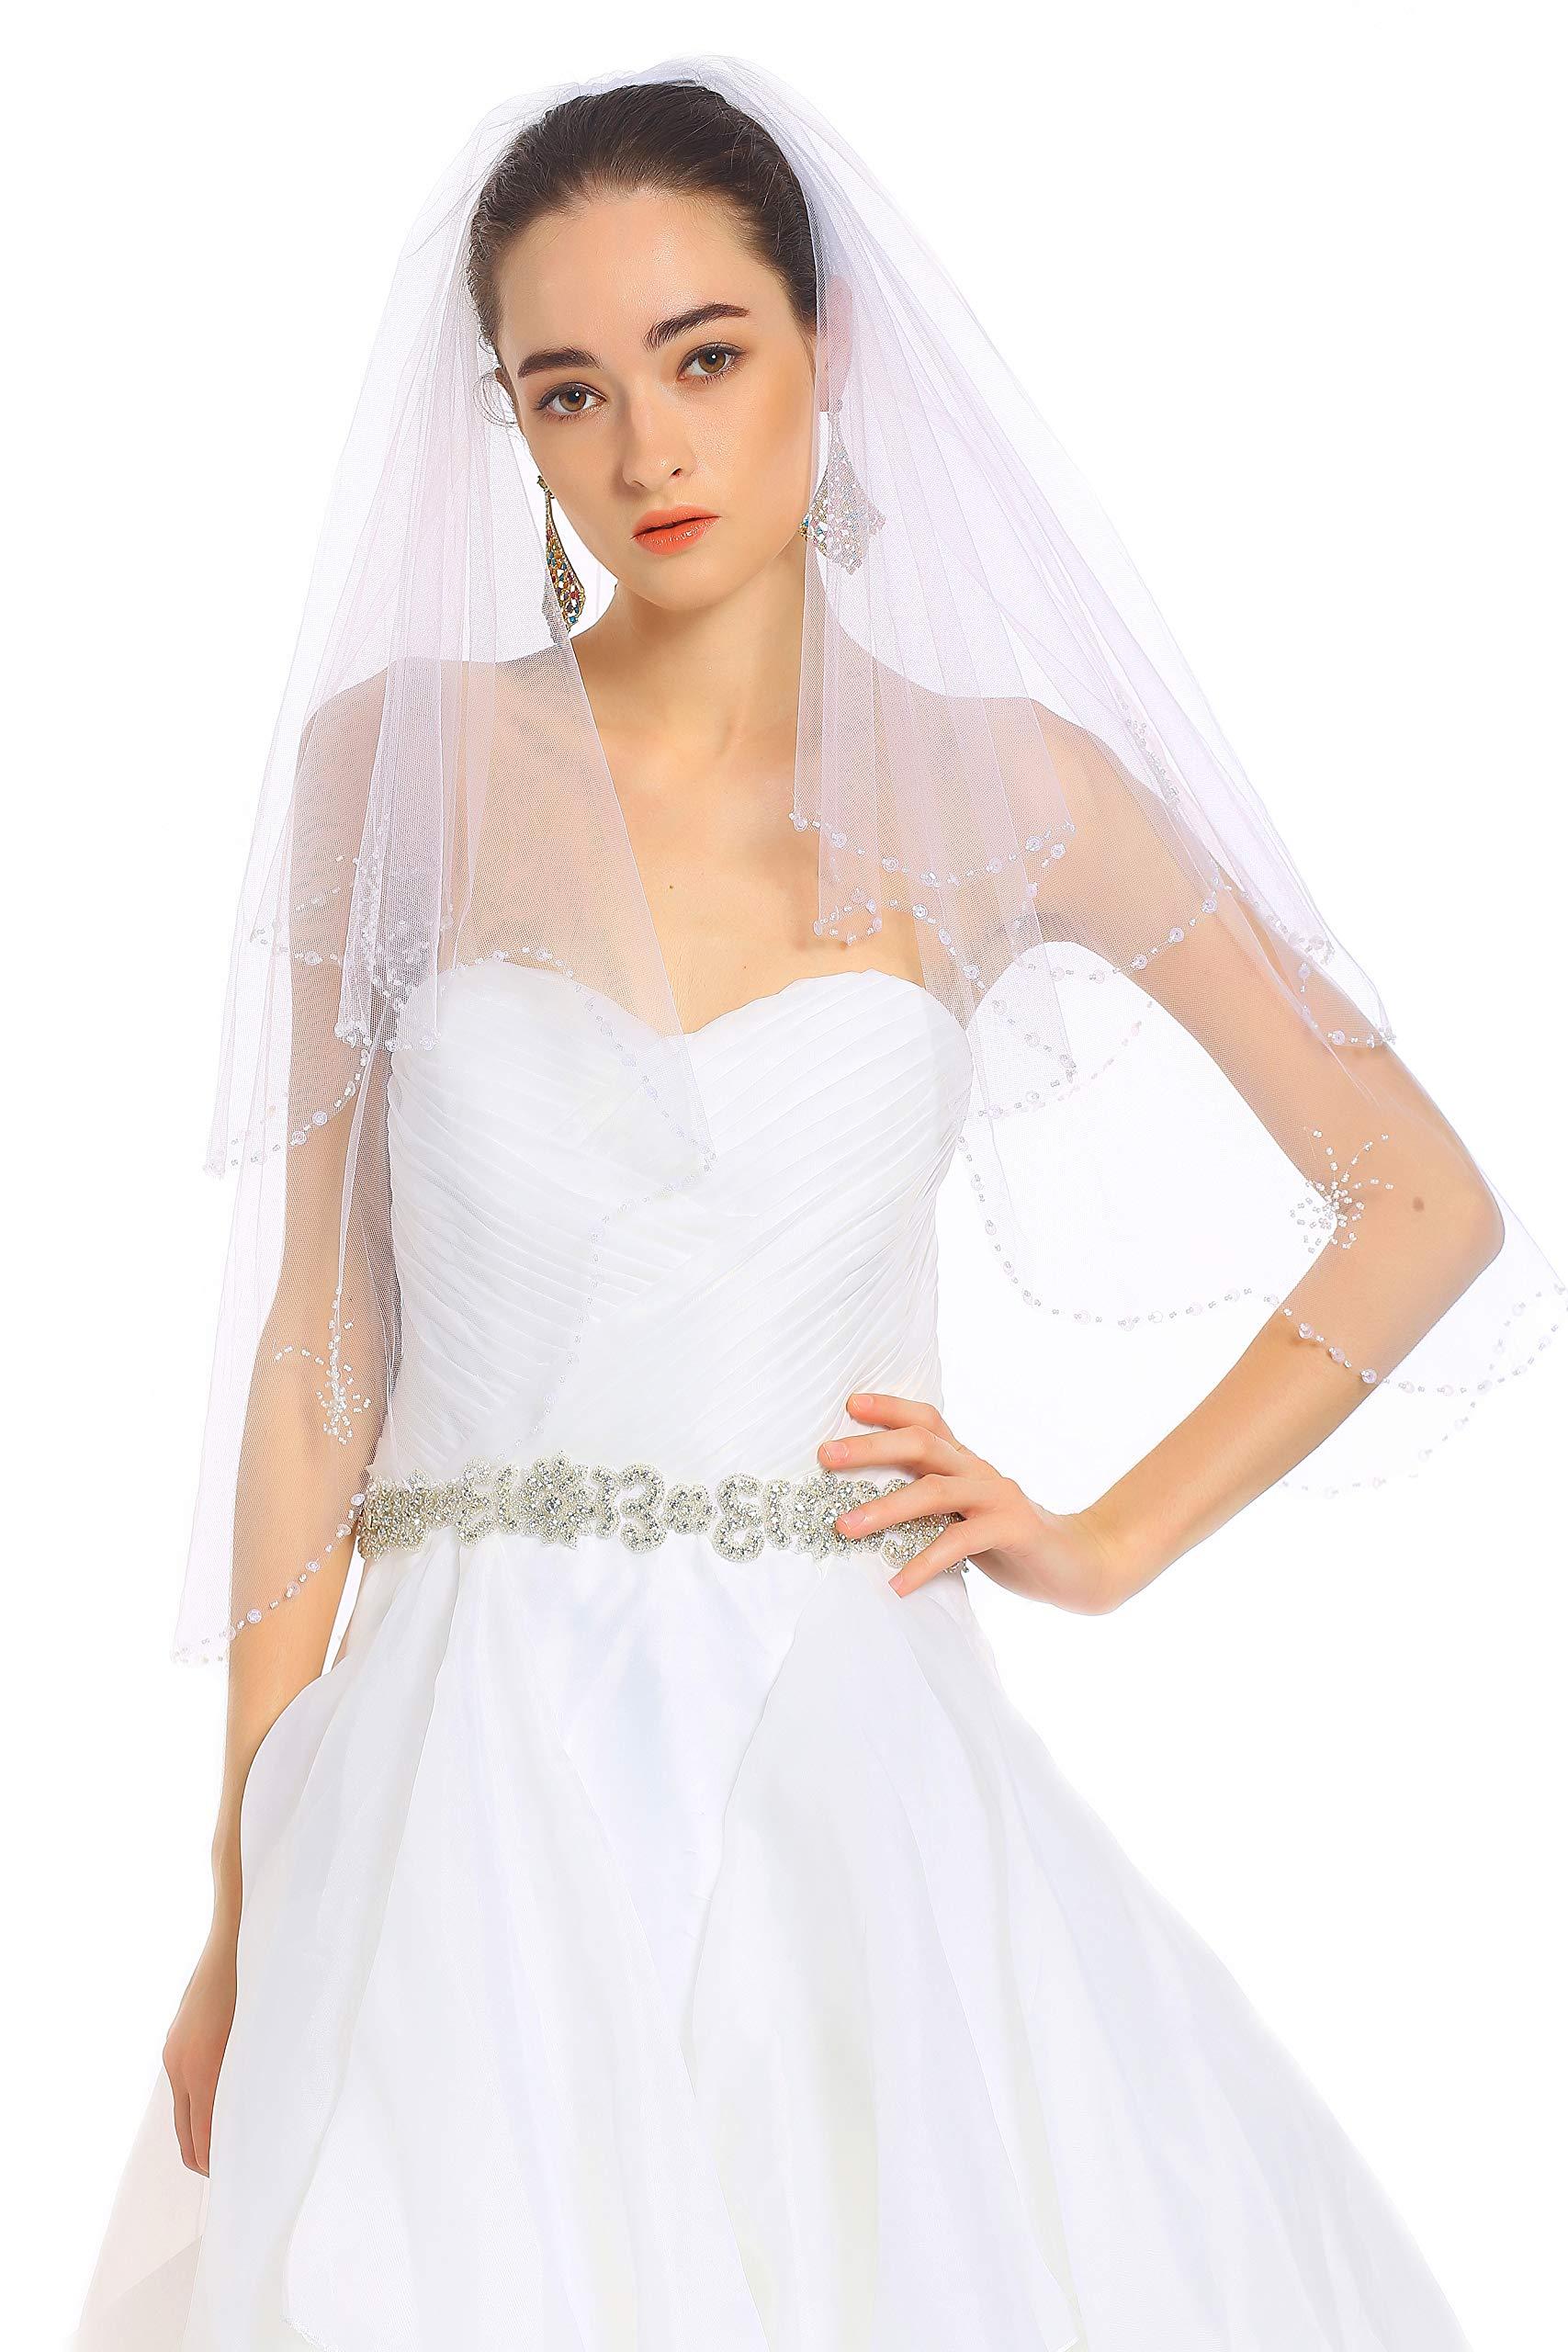 Passat Pale Ivory 2 Tiers Fingertip short vintage Wedding veils With Bling Sequin Beads veil for brides H14